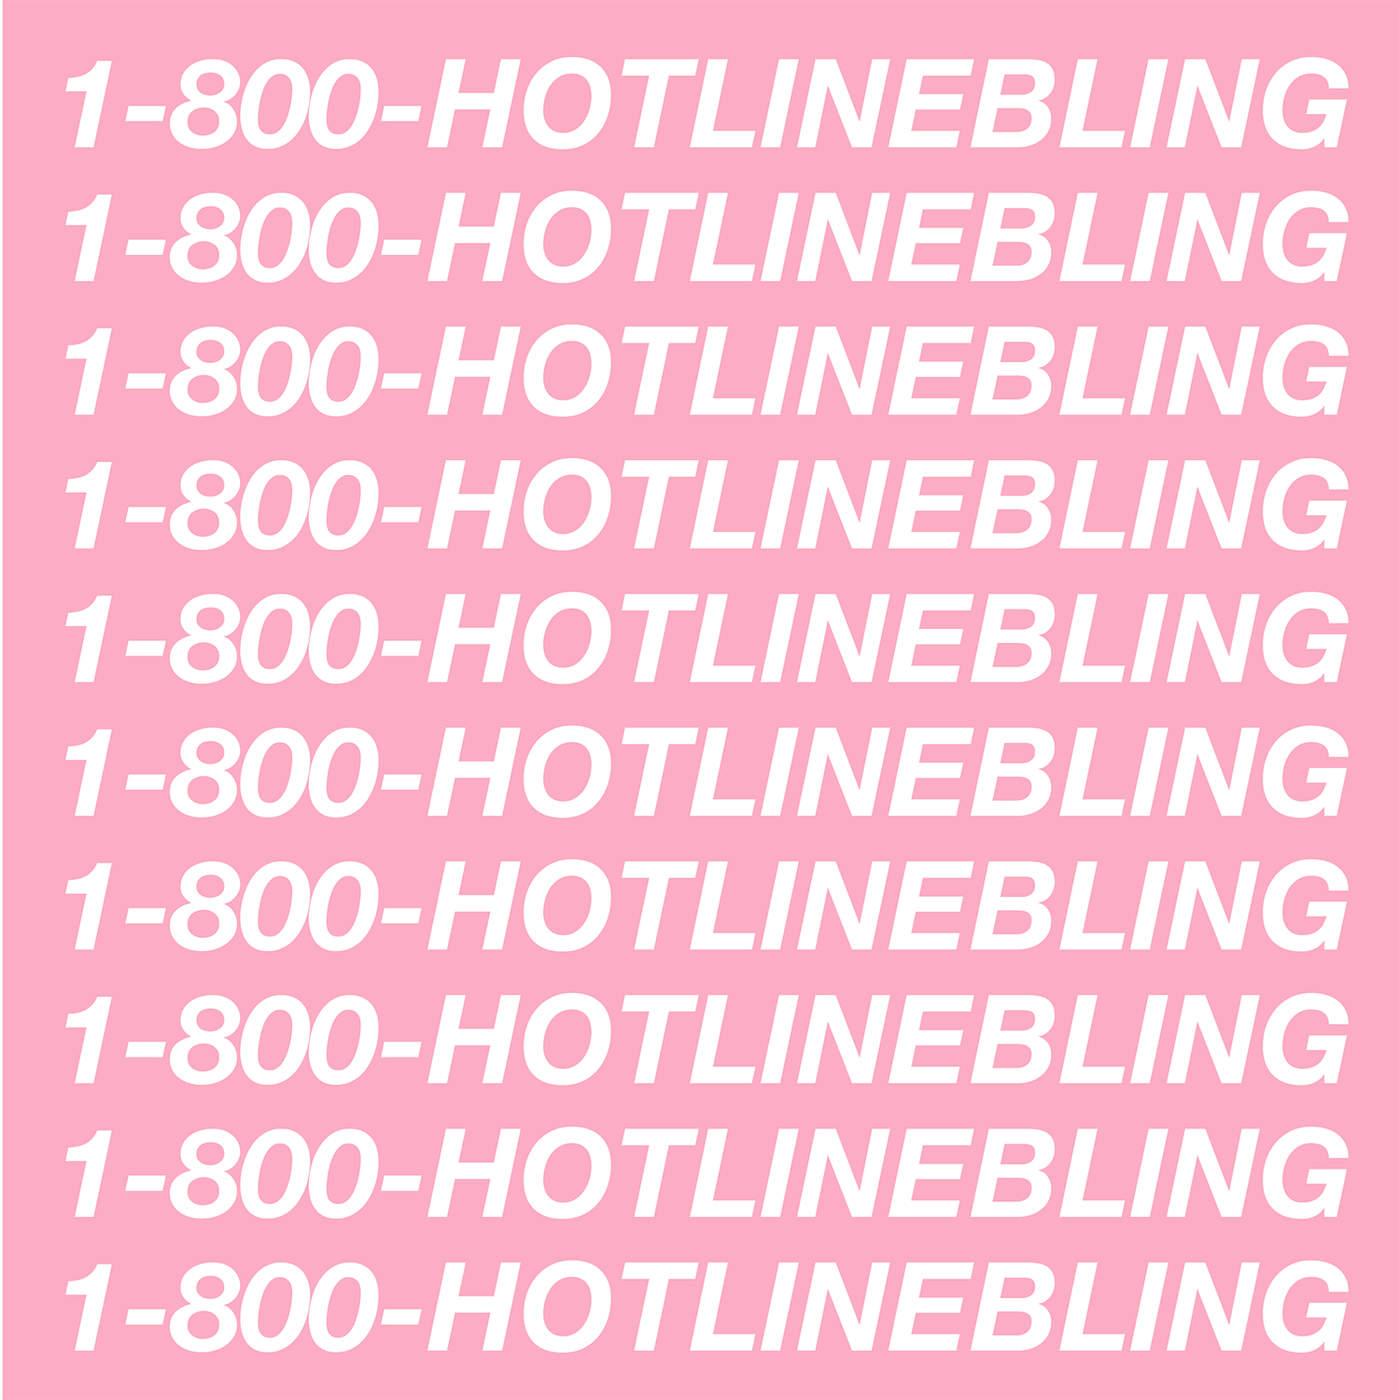 Drake_-_Hotline_Bling NOT BLURRY.png